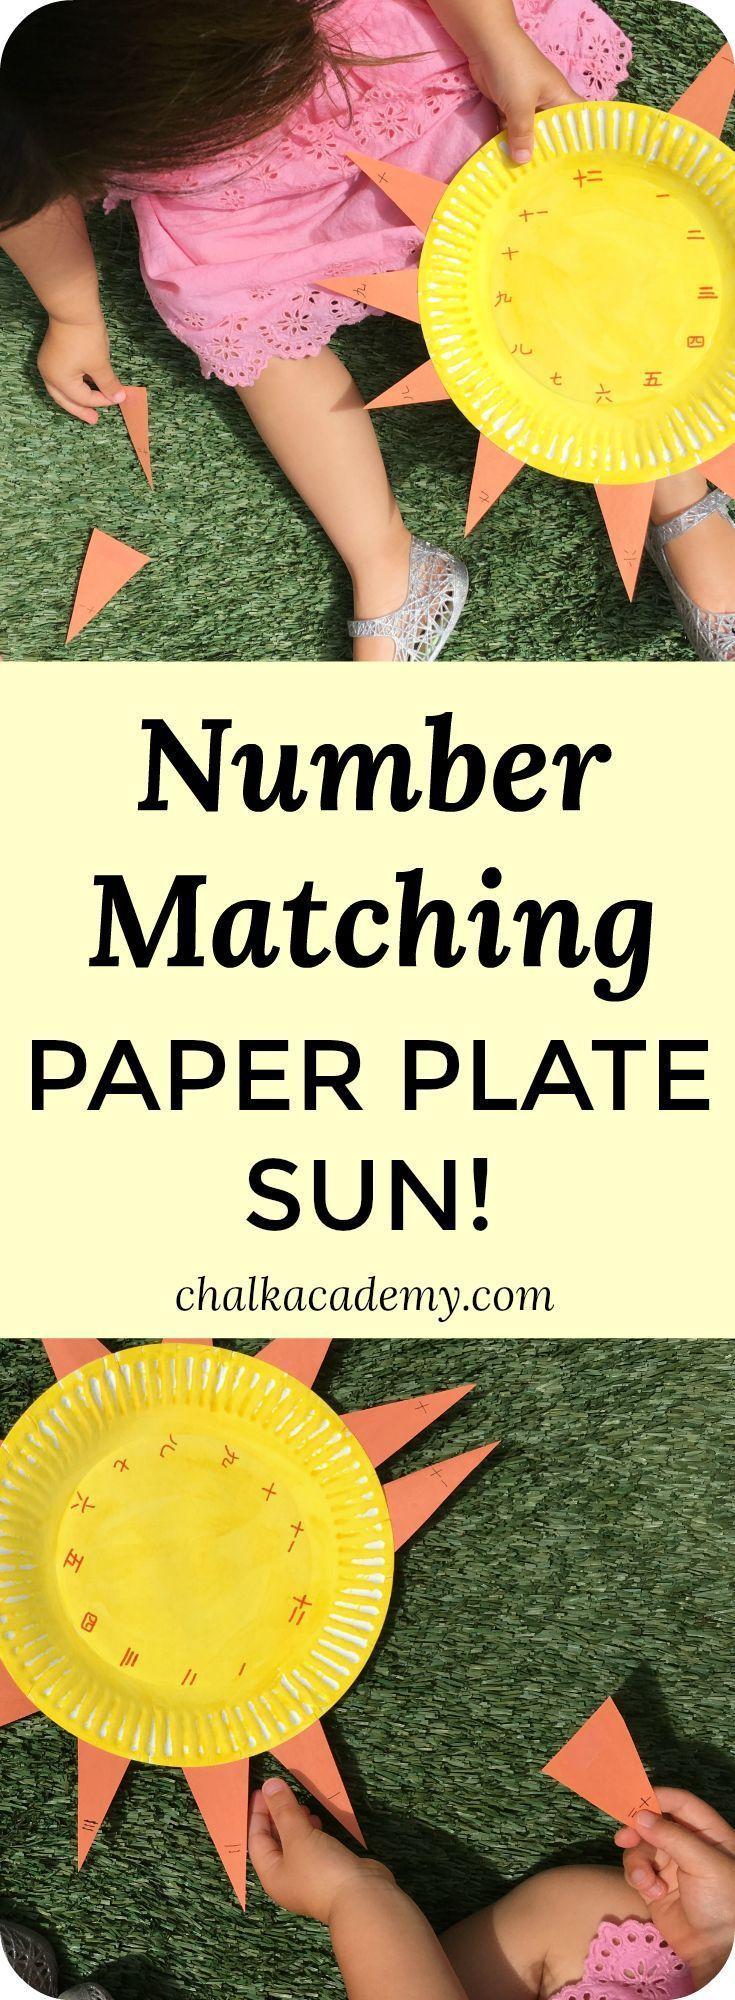 Game On Mohegan Sun Number